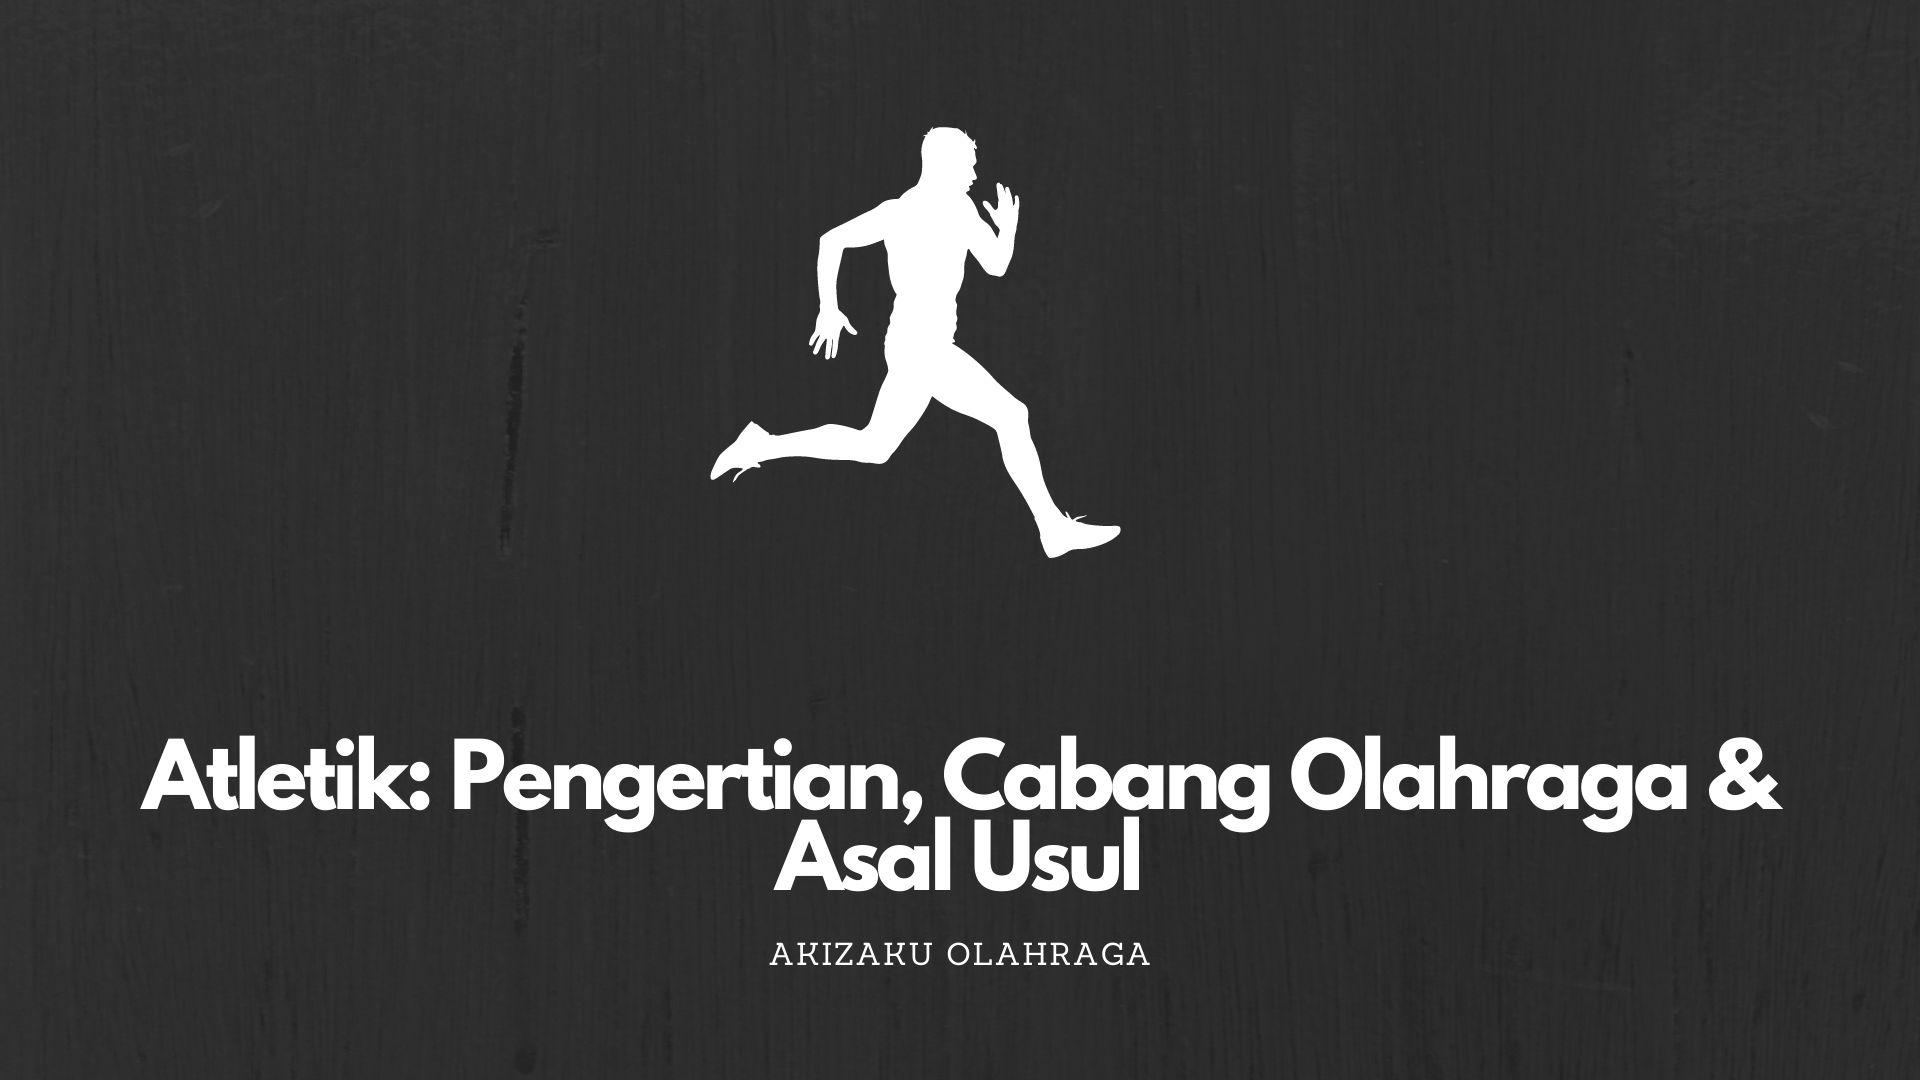 [Image: Atletik-Pengertian-Cabang-Olahraga-Asal-Usul.jpg]